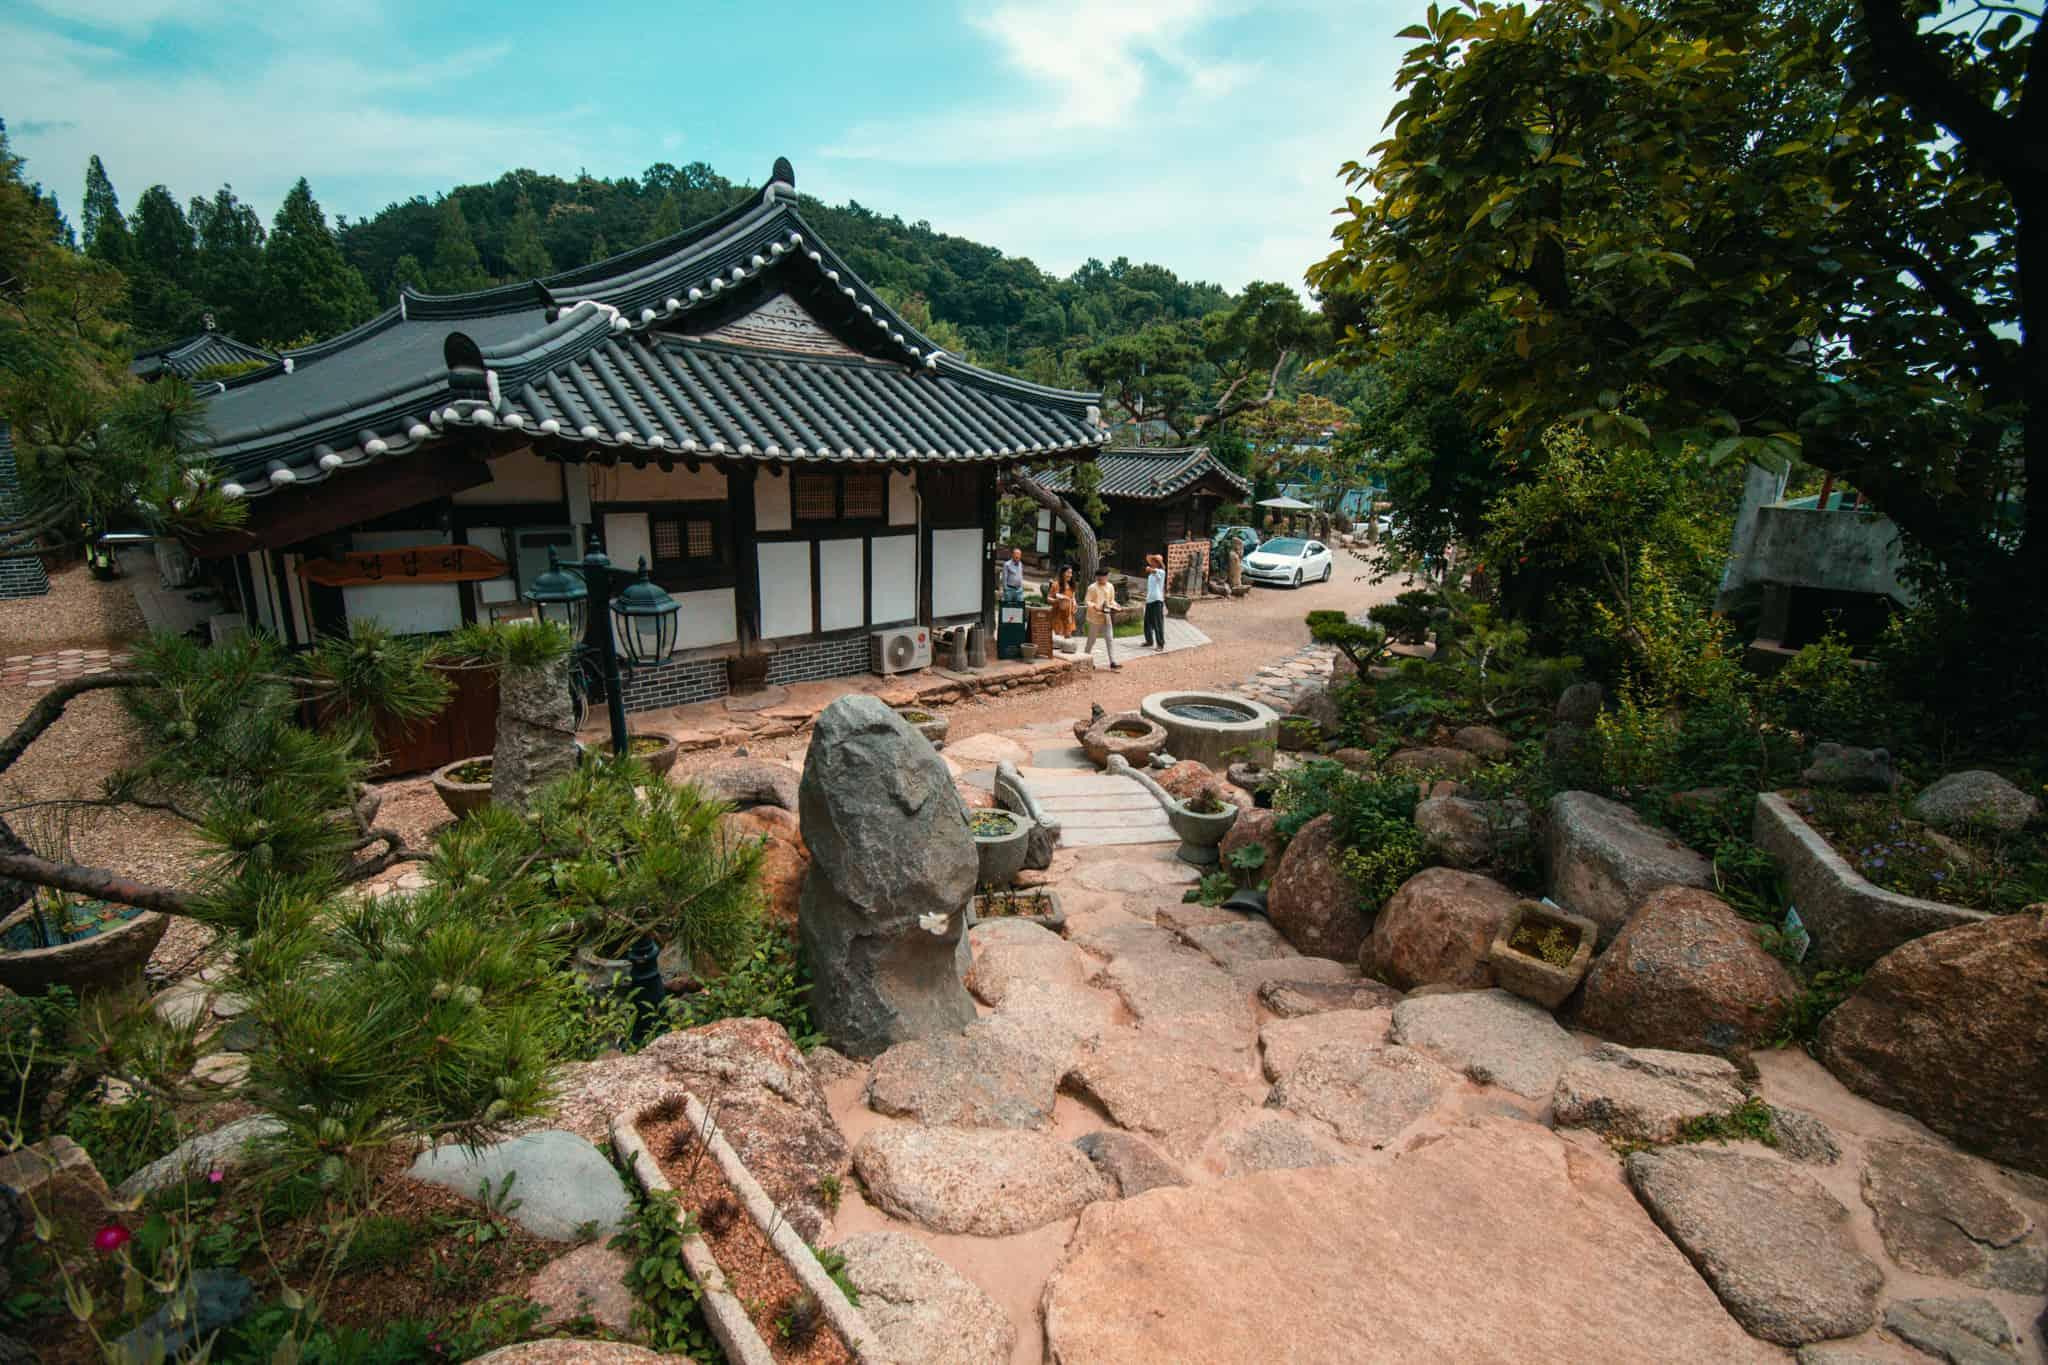 Teahouse in Boseong